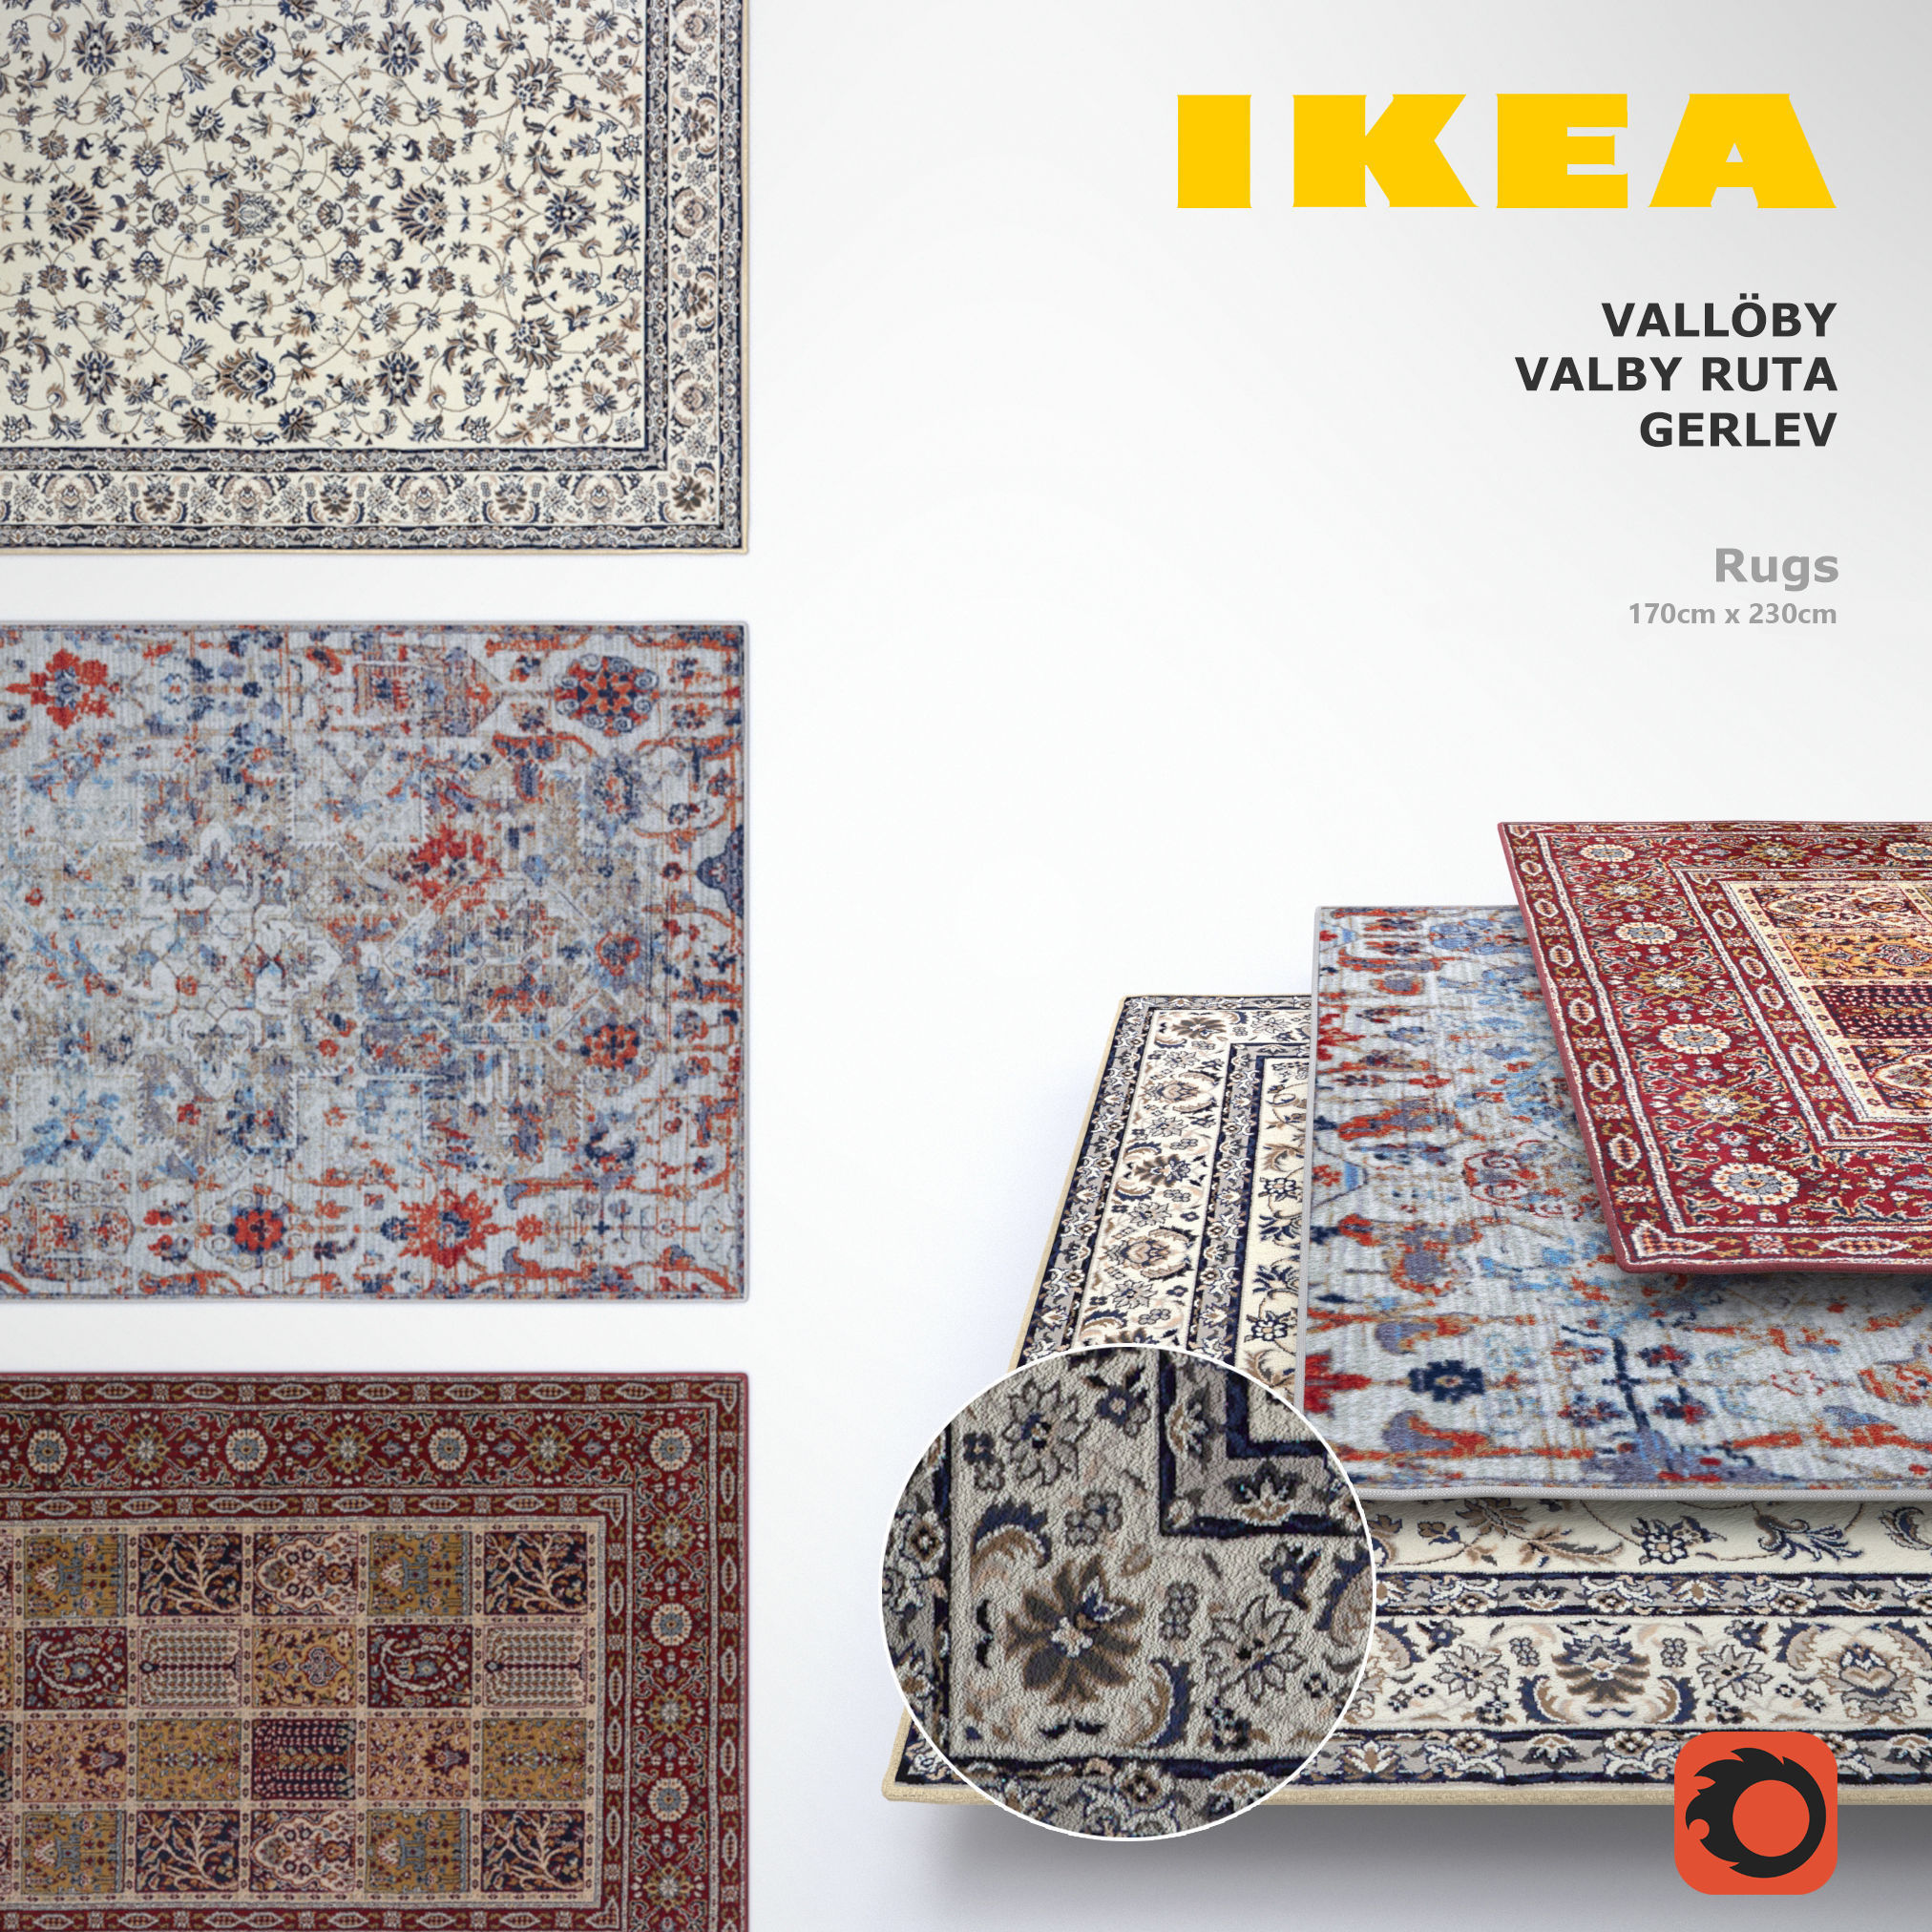 Ikea Rugs Set Model Max Obj Mtl 1